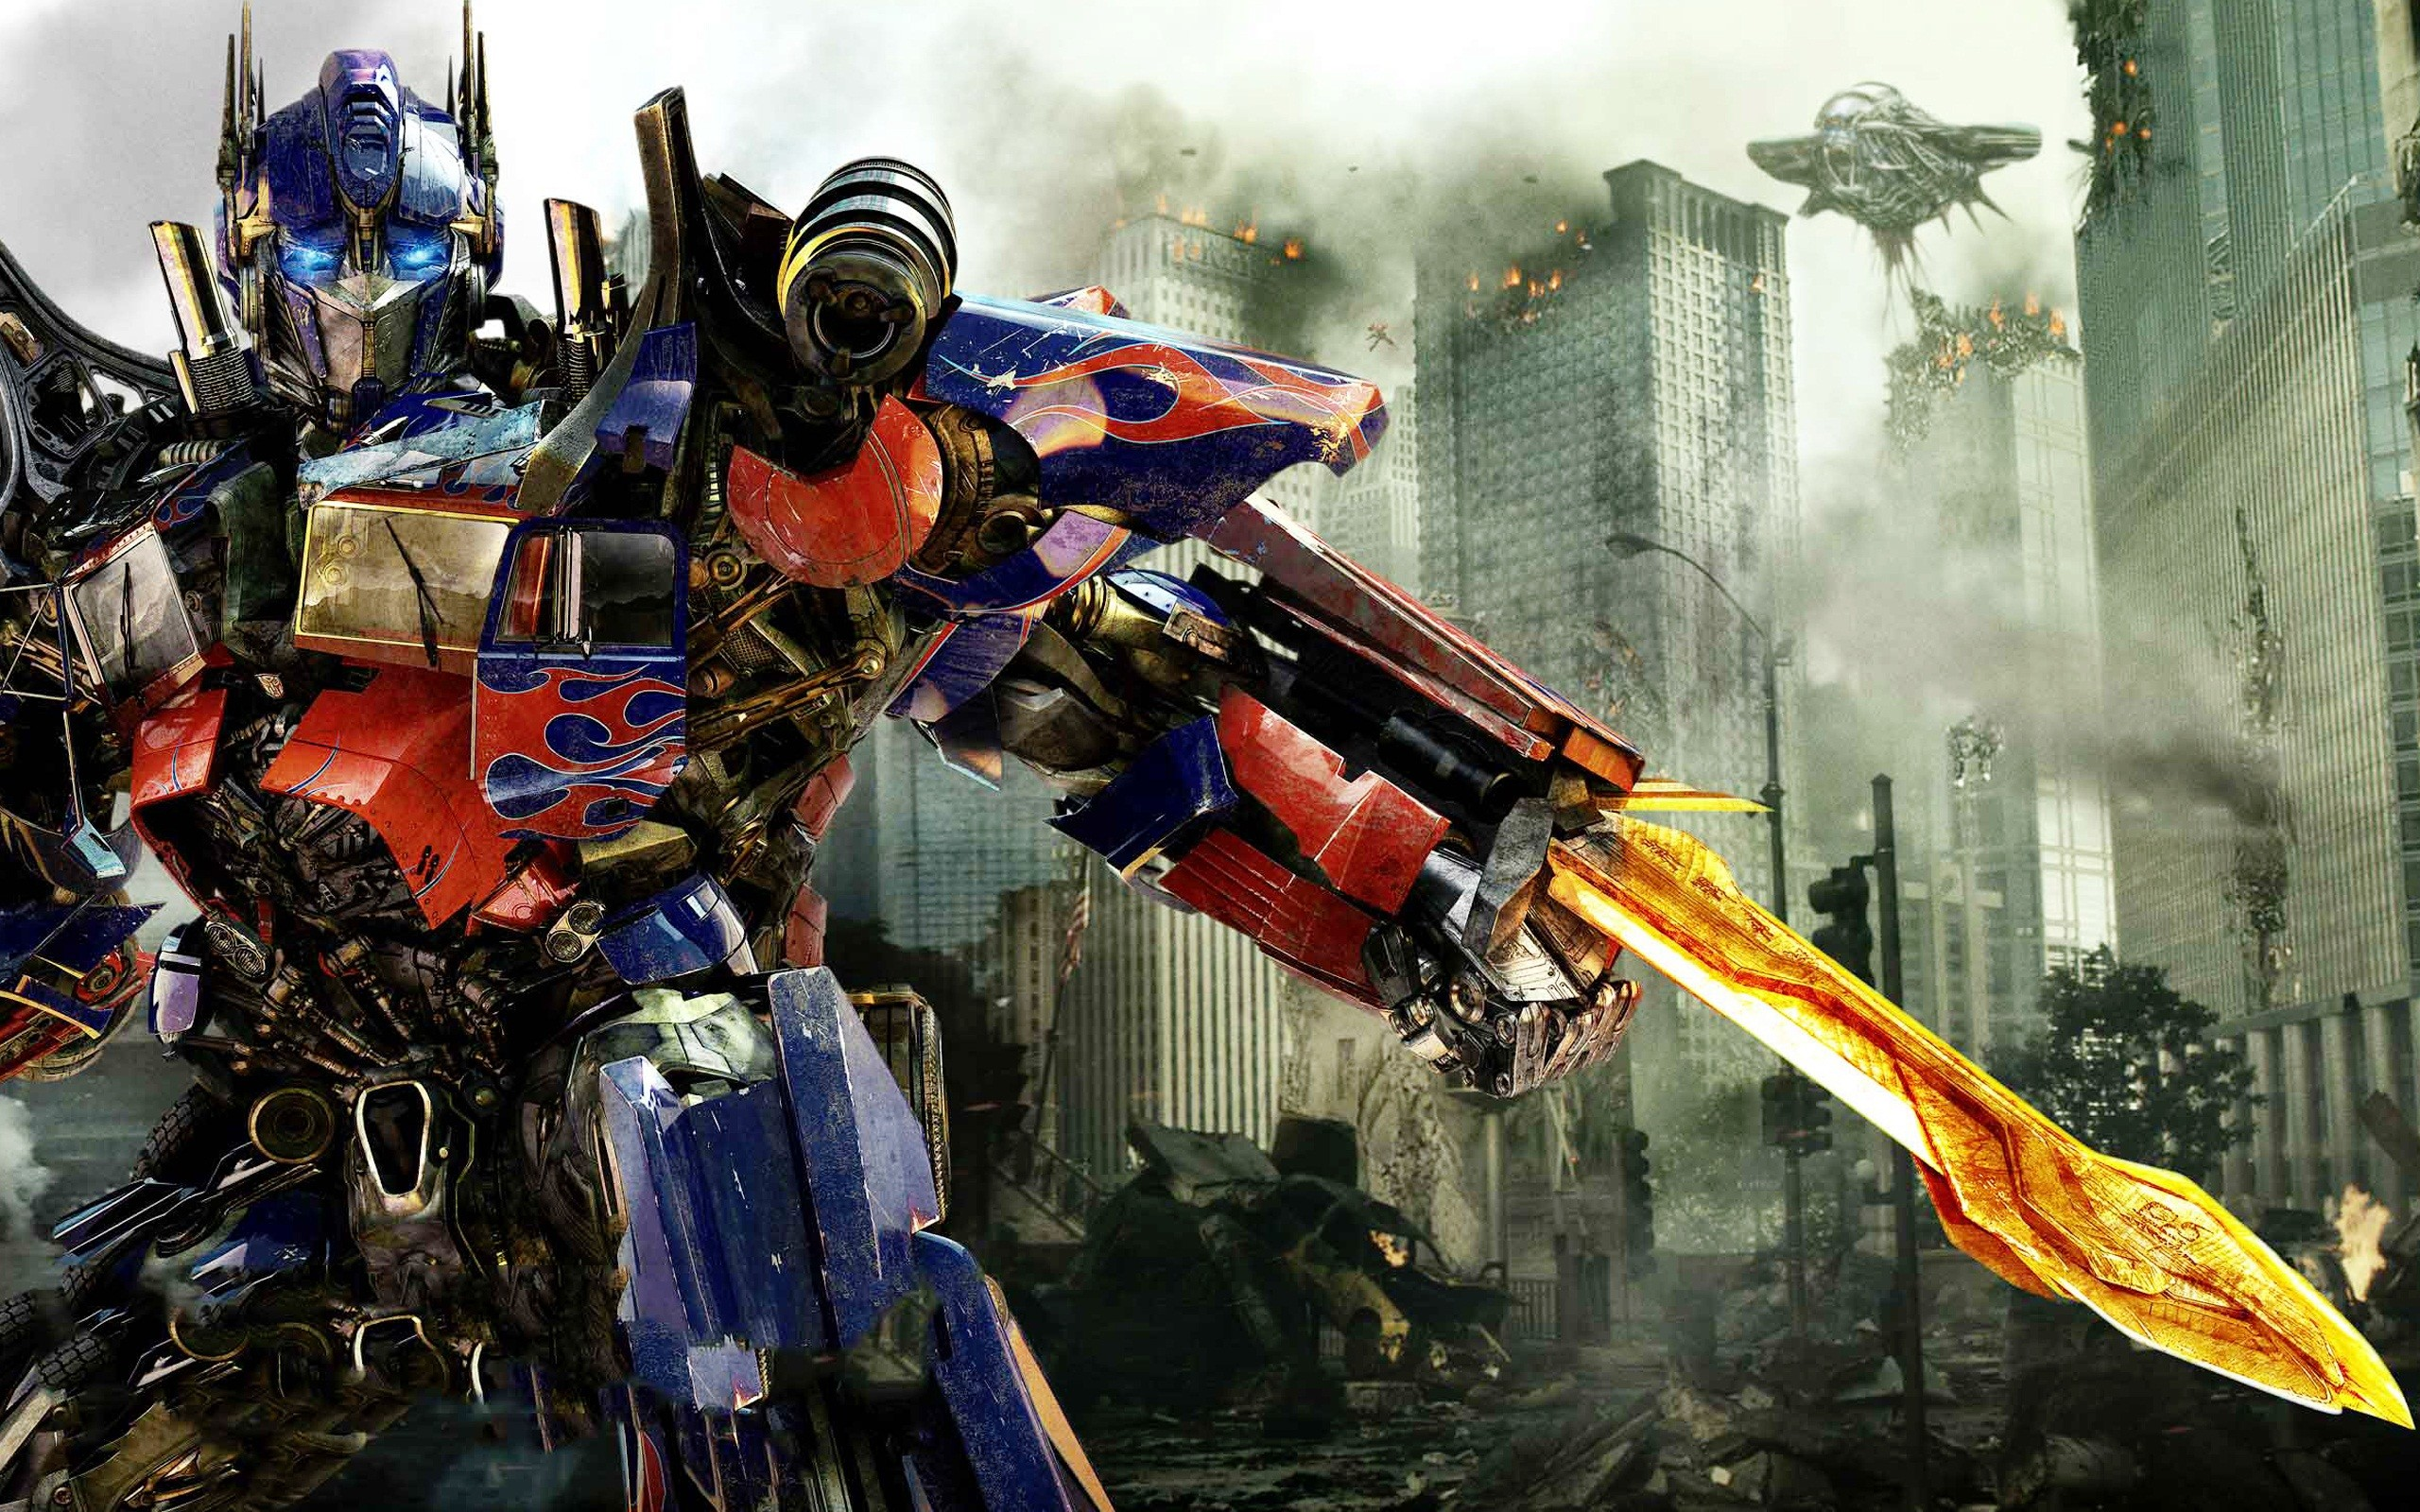 Transformers 2 Optimus Prime Wallpaper 71 Pictures